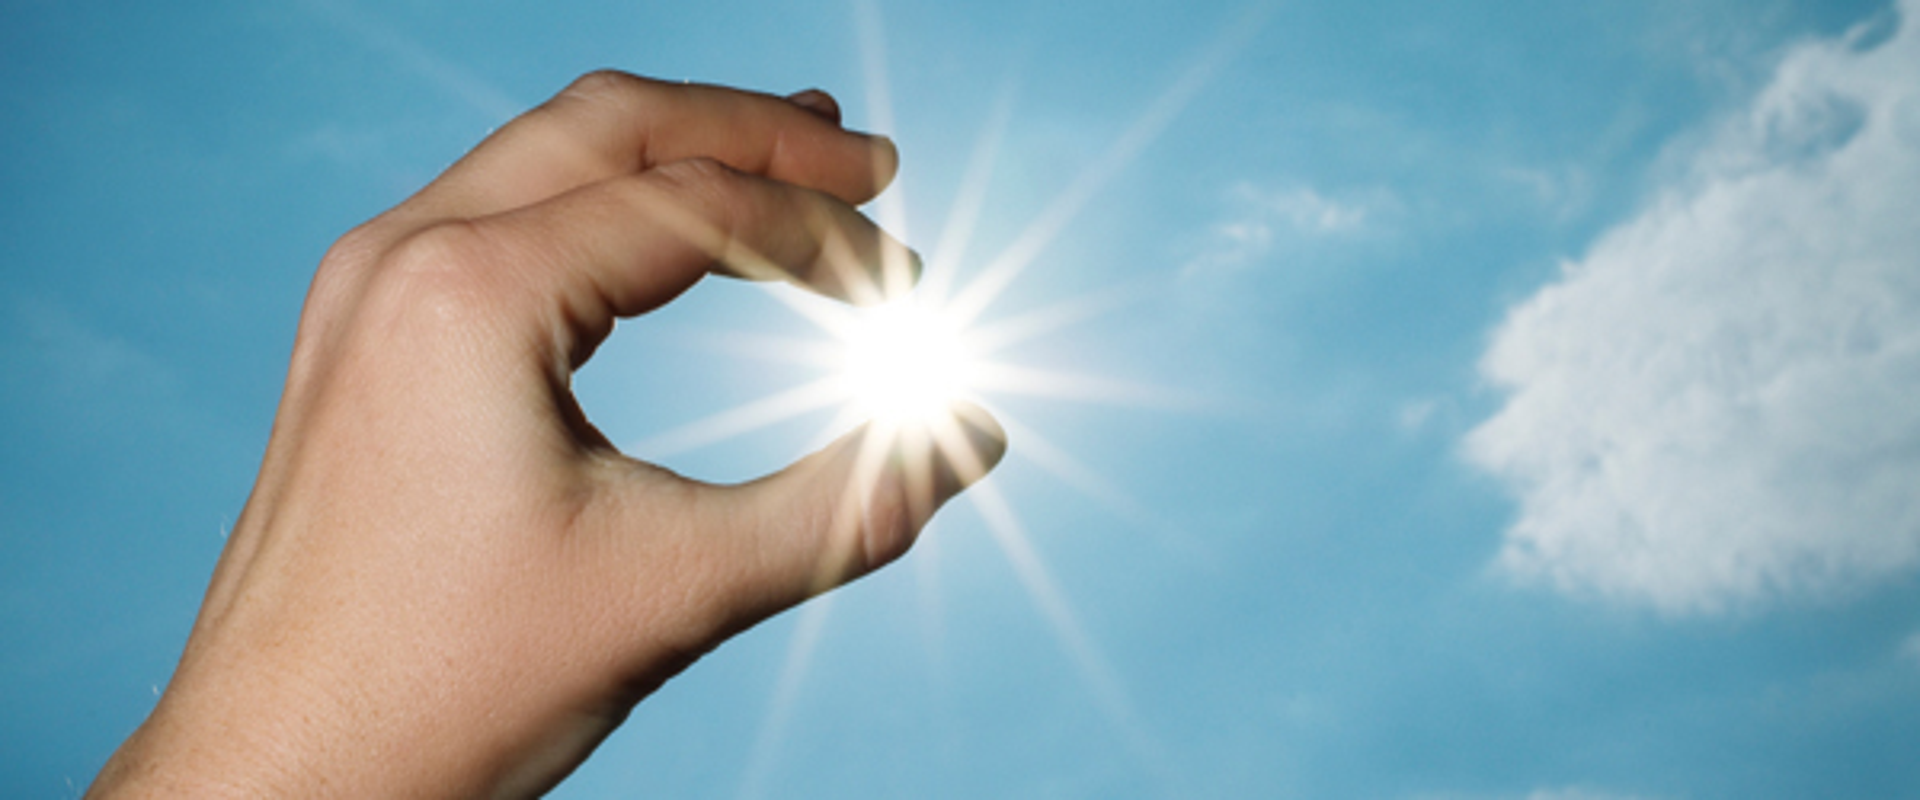 Nhung lam tuong tai hai ve vitamin D thuong gap-Hinh-7